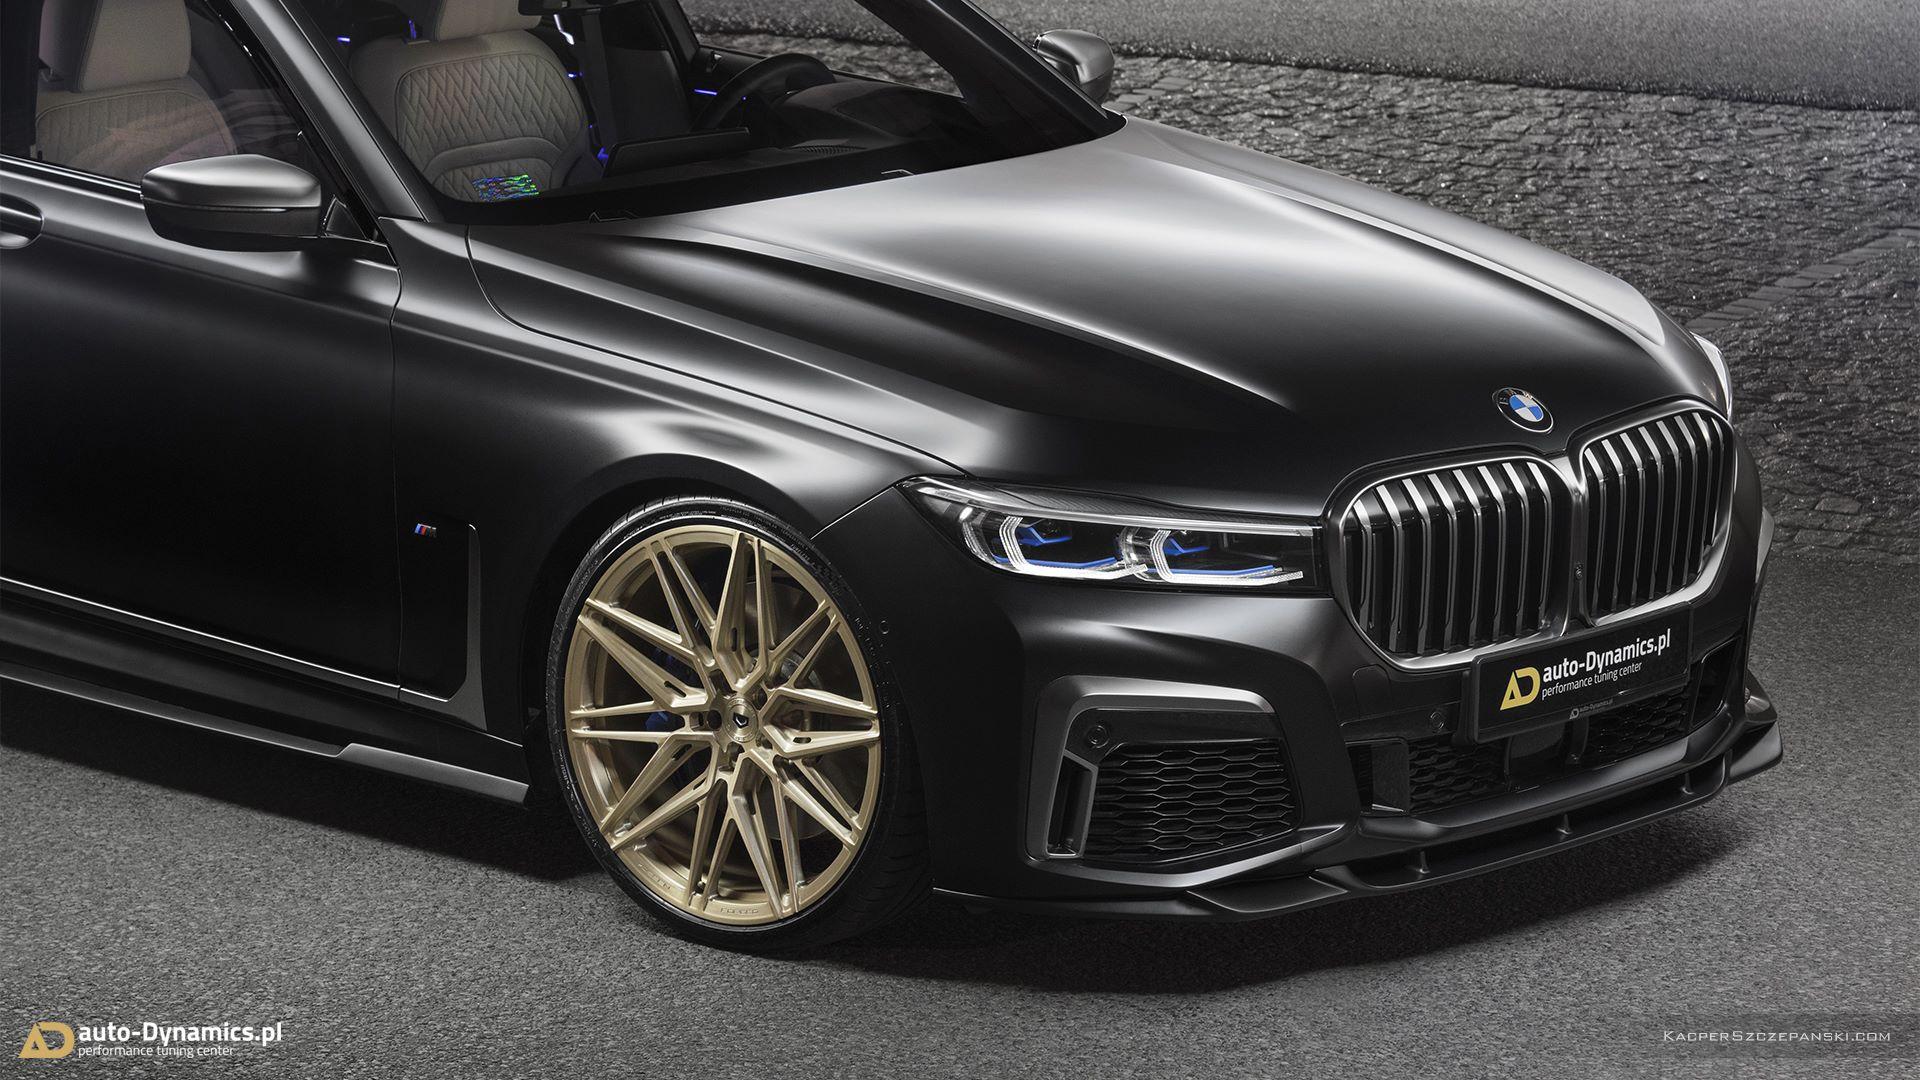 BMW-M760Li-by-Auto-Dynamics-4